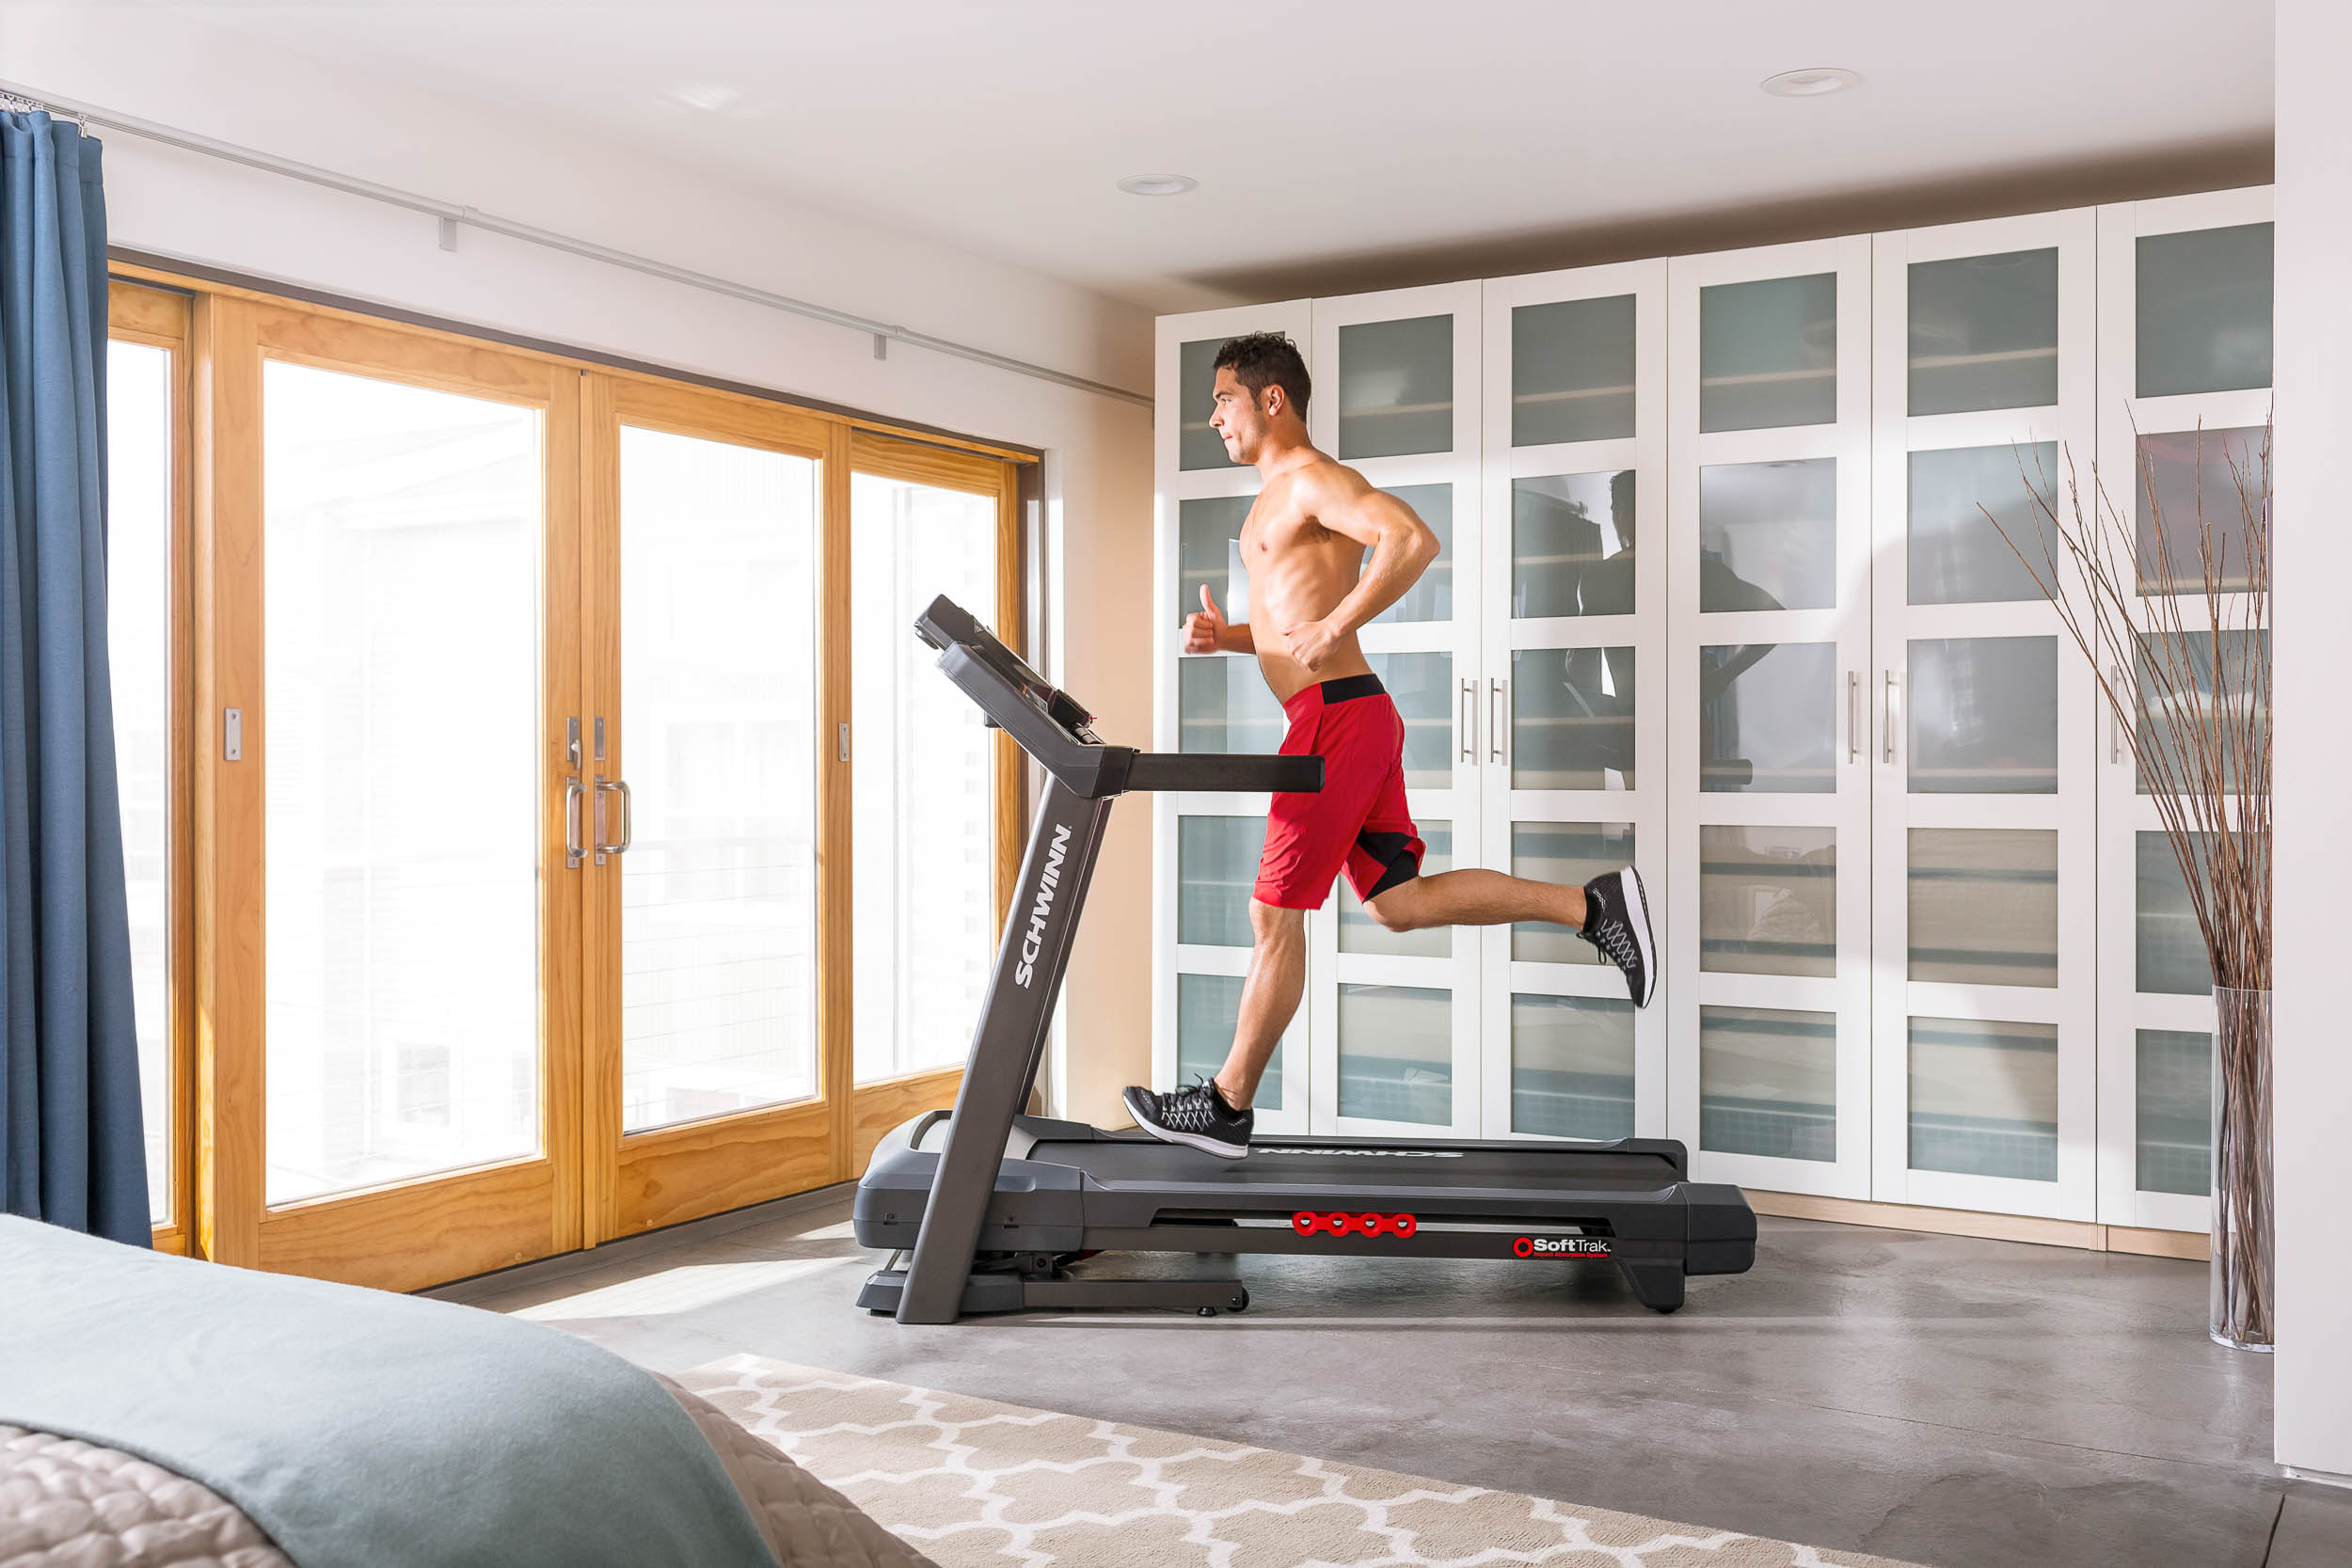 Nautilus_Direct_116099_Schwinn Treadmill T830 Profile Clay-0856 copy.jpg